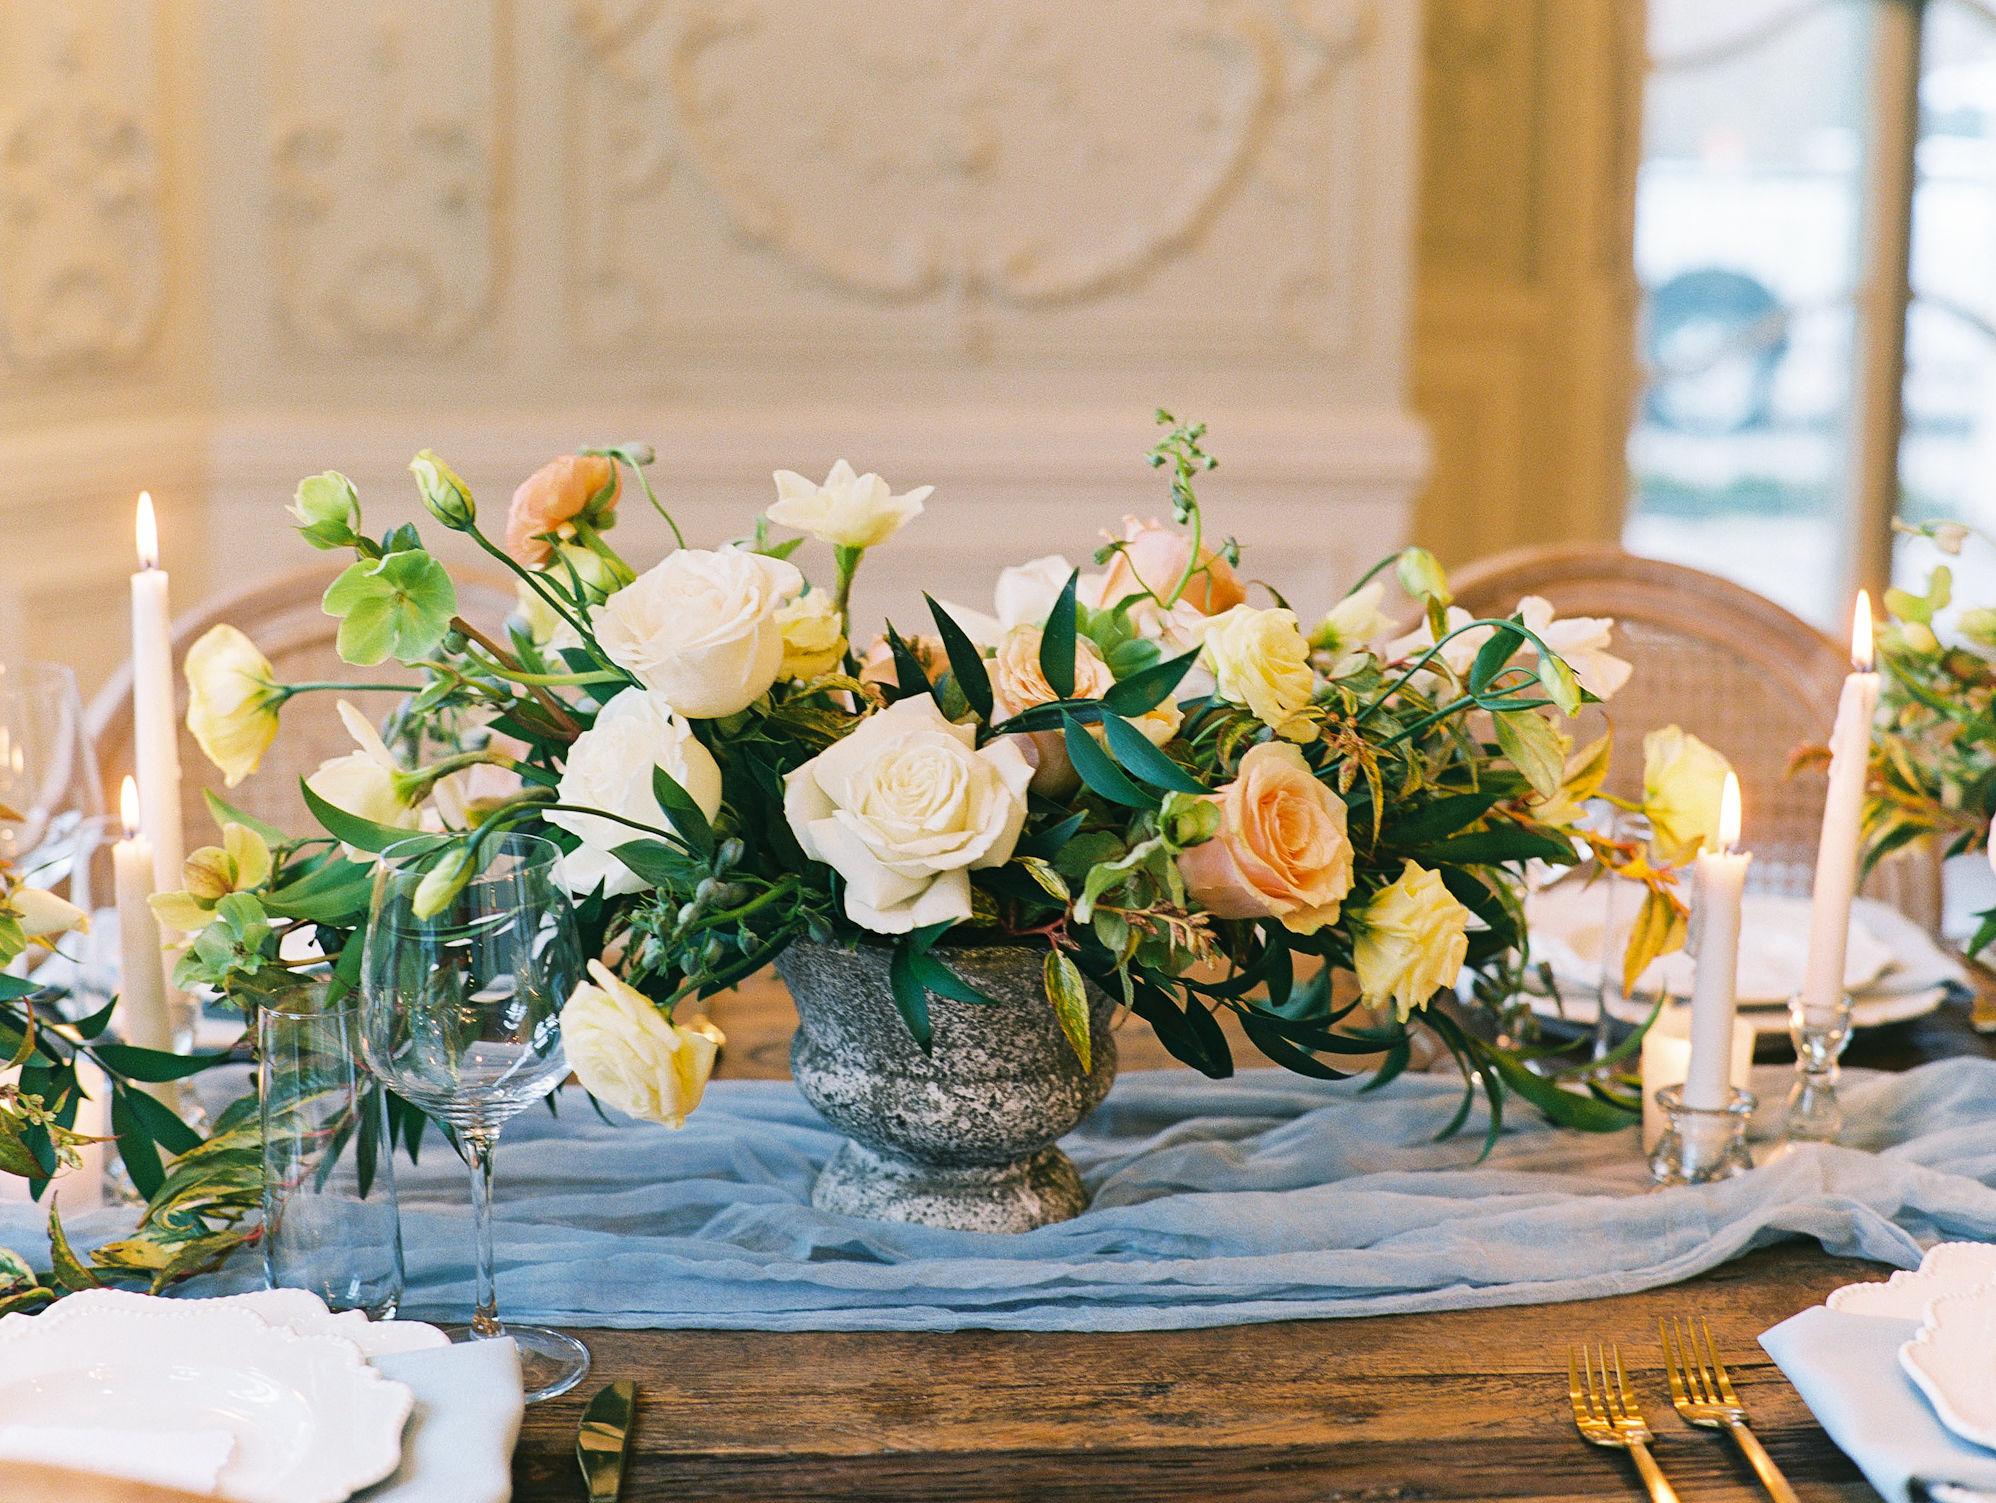 Romantic Rose Greenery Low Wedding Centerpiece